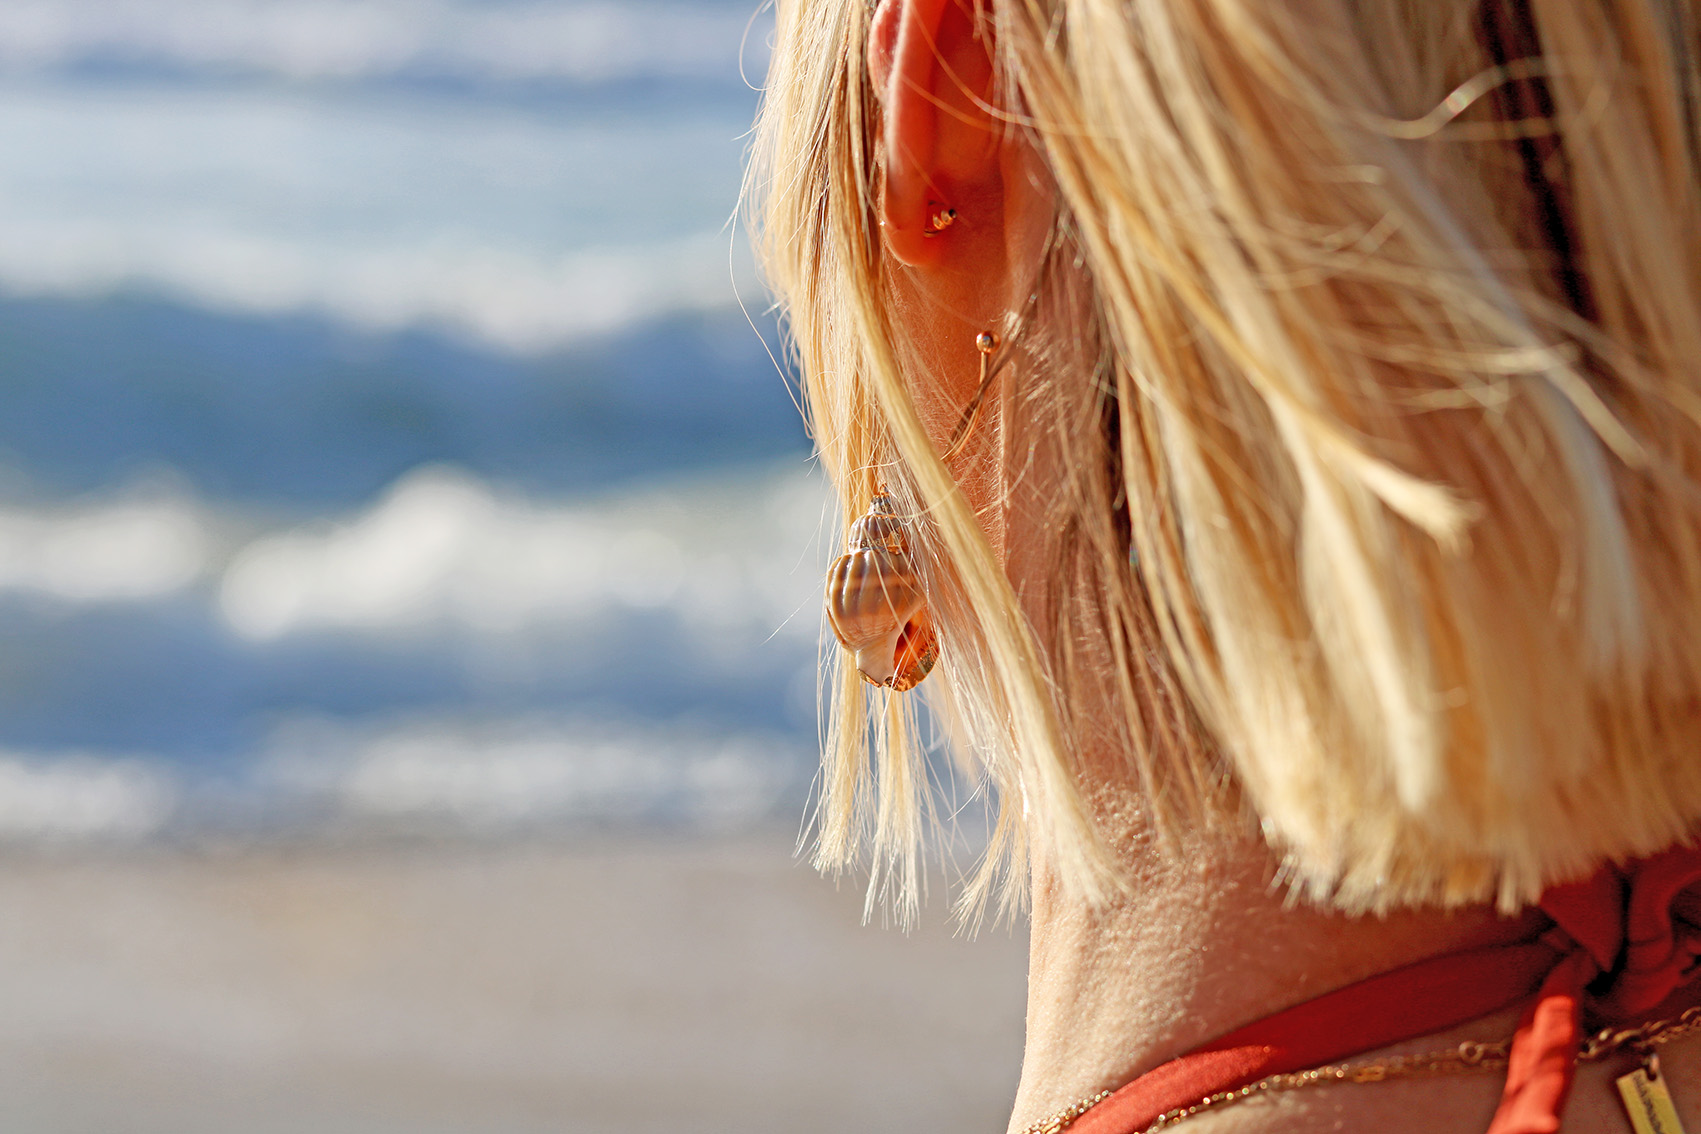 boucle-d-oreilles-coquillage